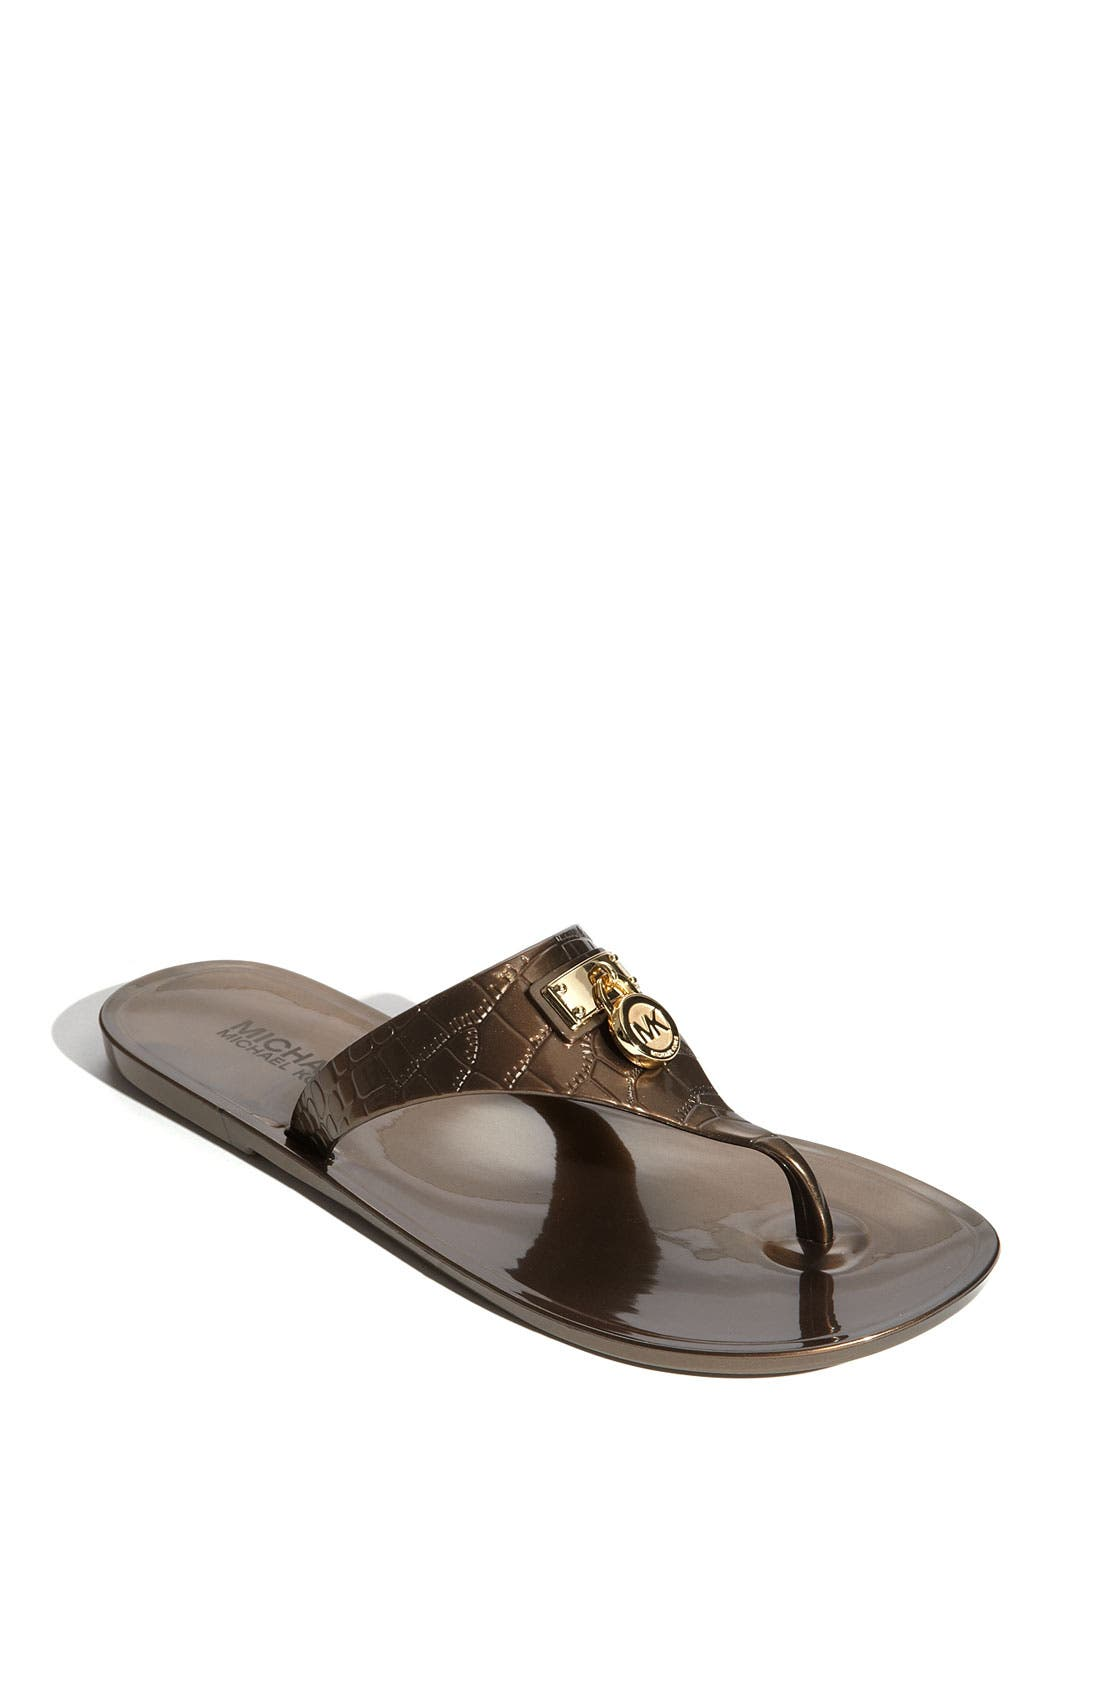 Main Image - MICHAEL Michael Kors 'Hamilton Croco Jelly' Sandal